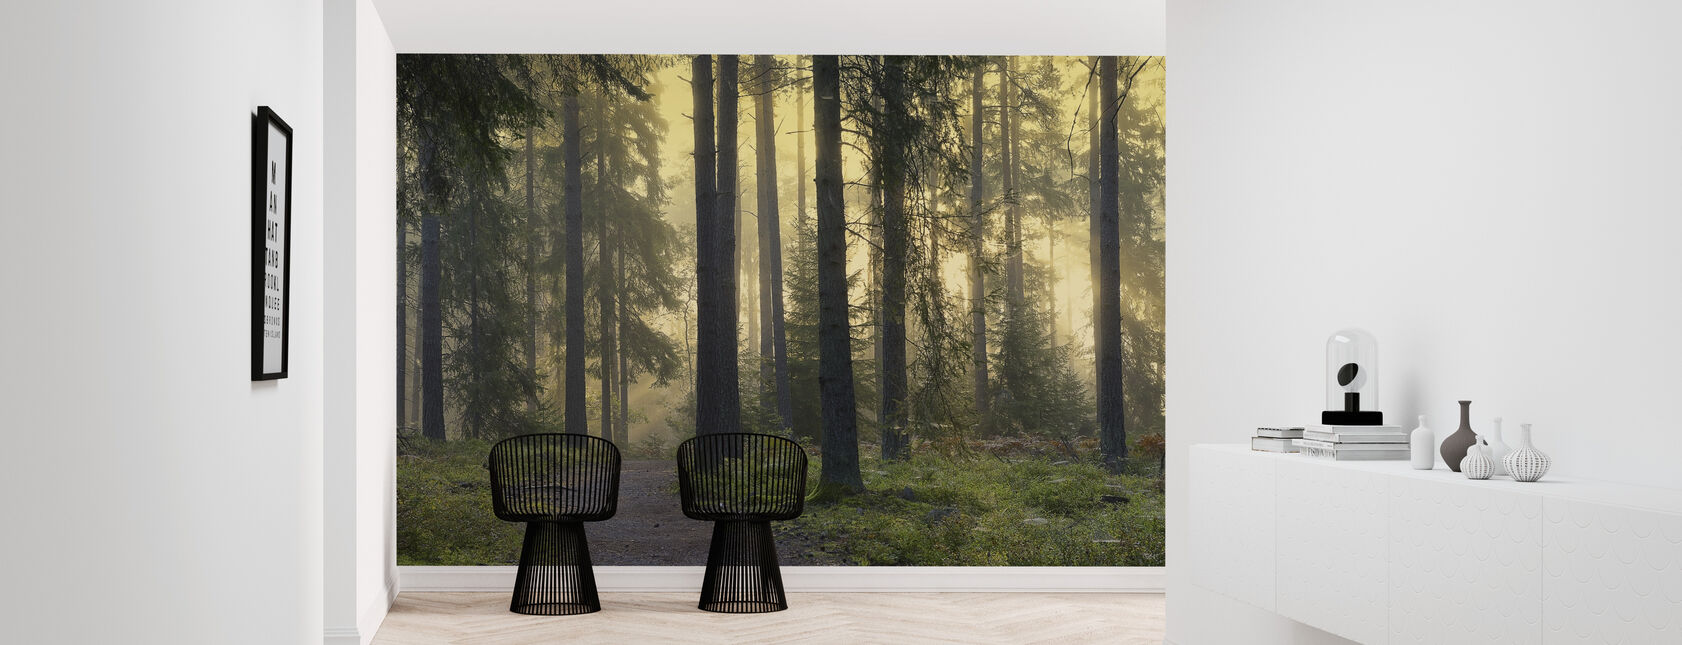 Sendero forestal - Papel pintado - Corredor